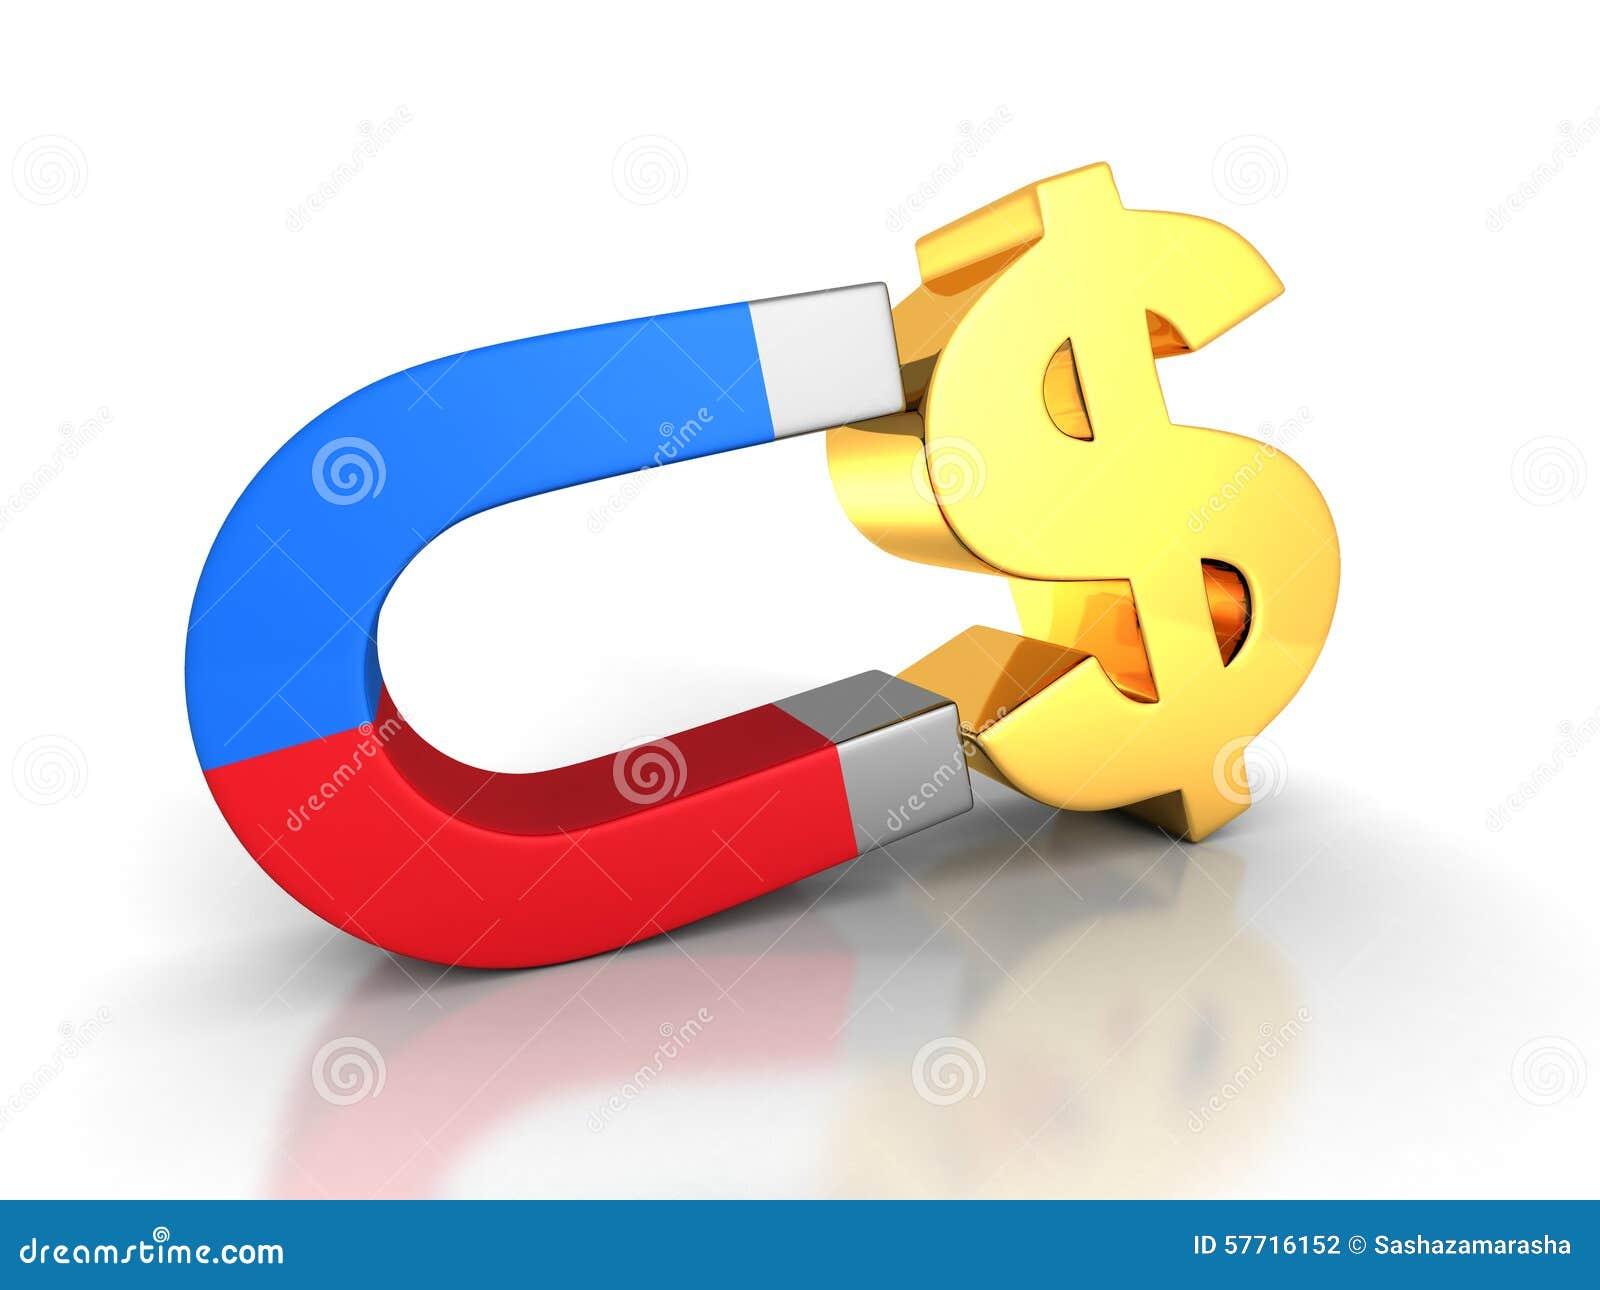 Attract money symbol emoji